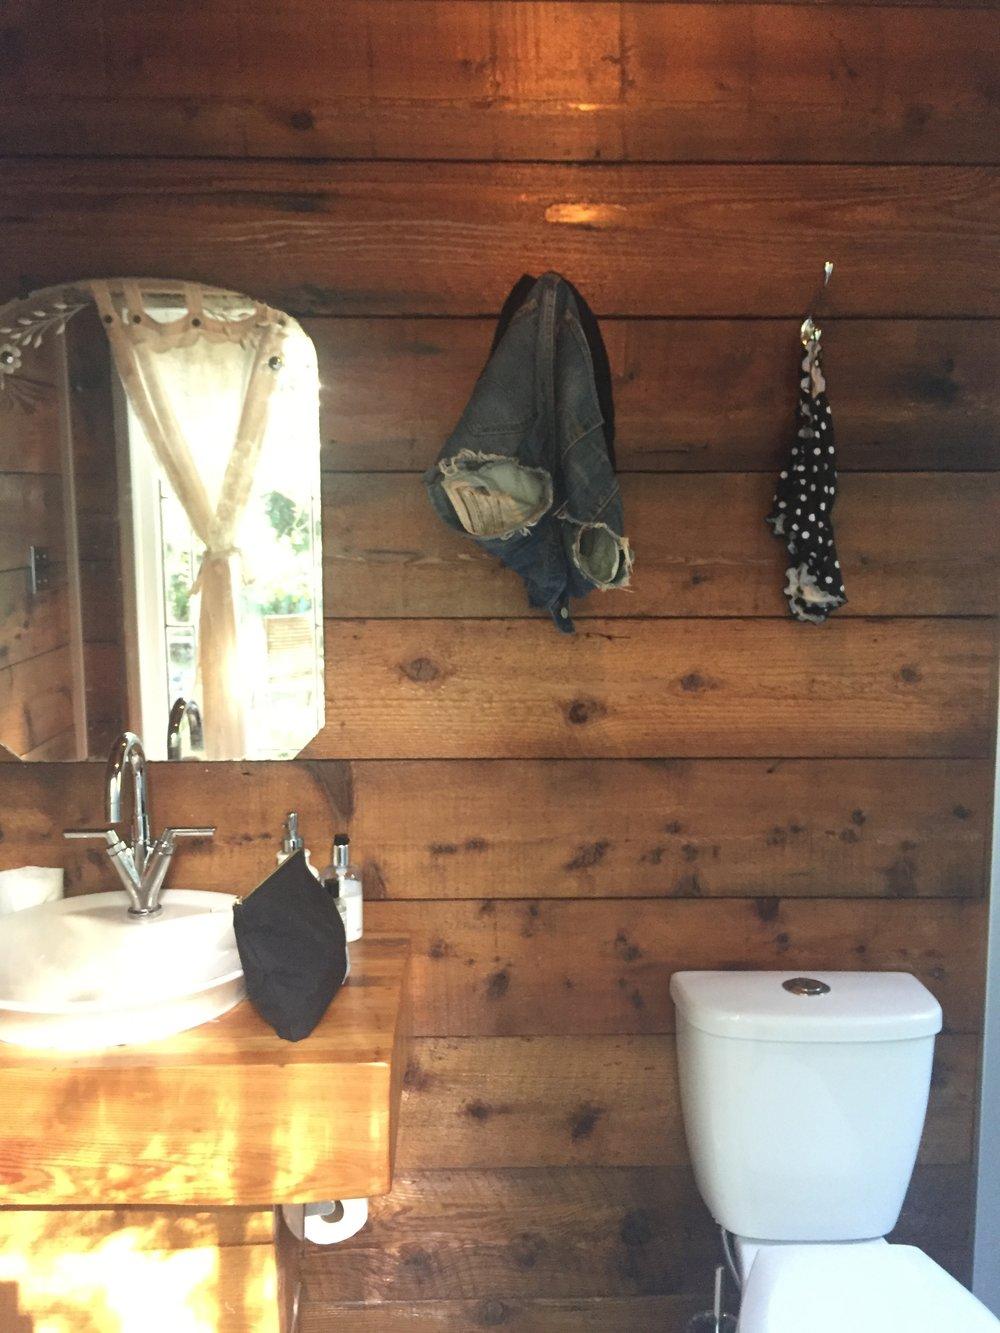 Bathroom that smells like cedar? Check.